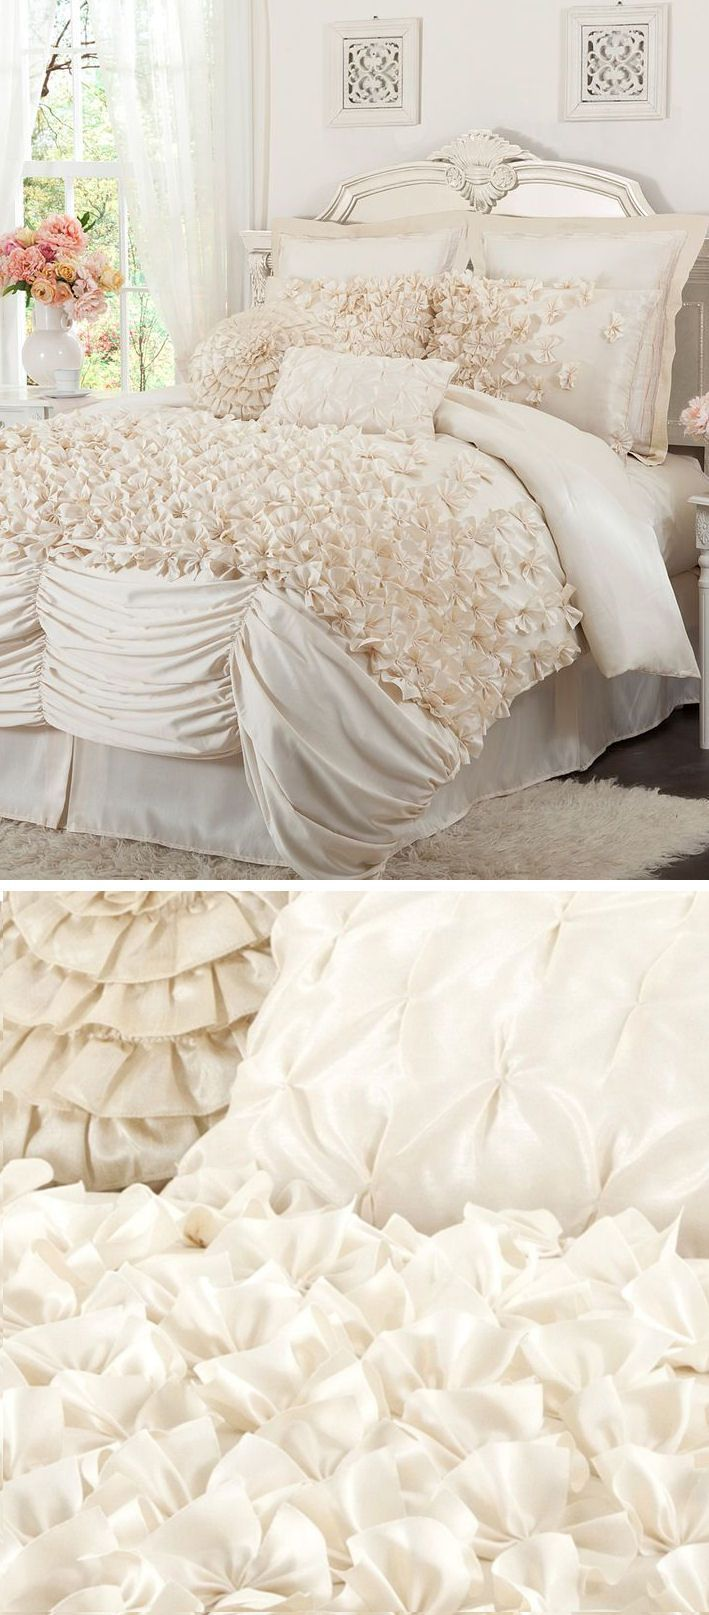 Lovely Ivory Layered Ruffle Comforter Set ♥ L.O.V.E.